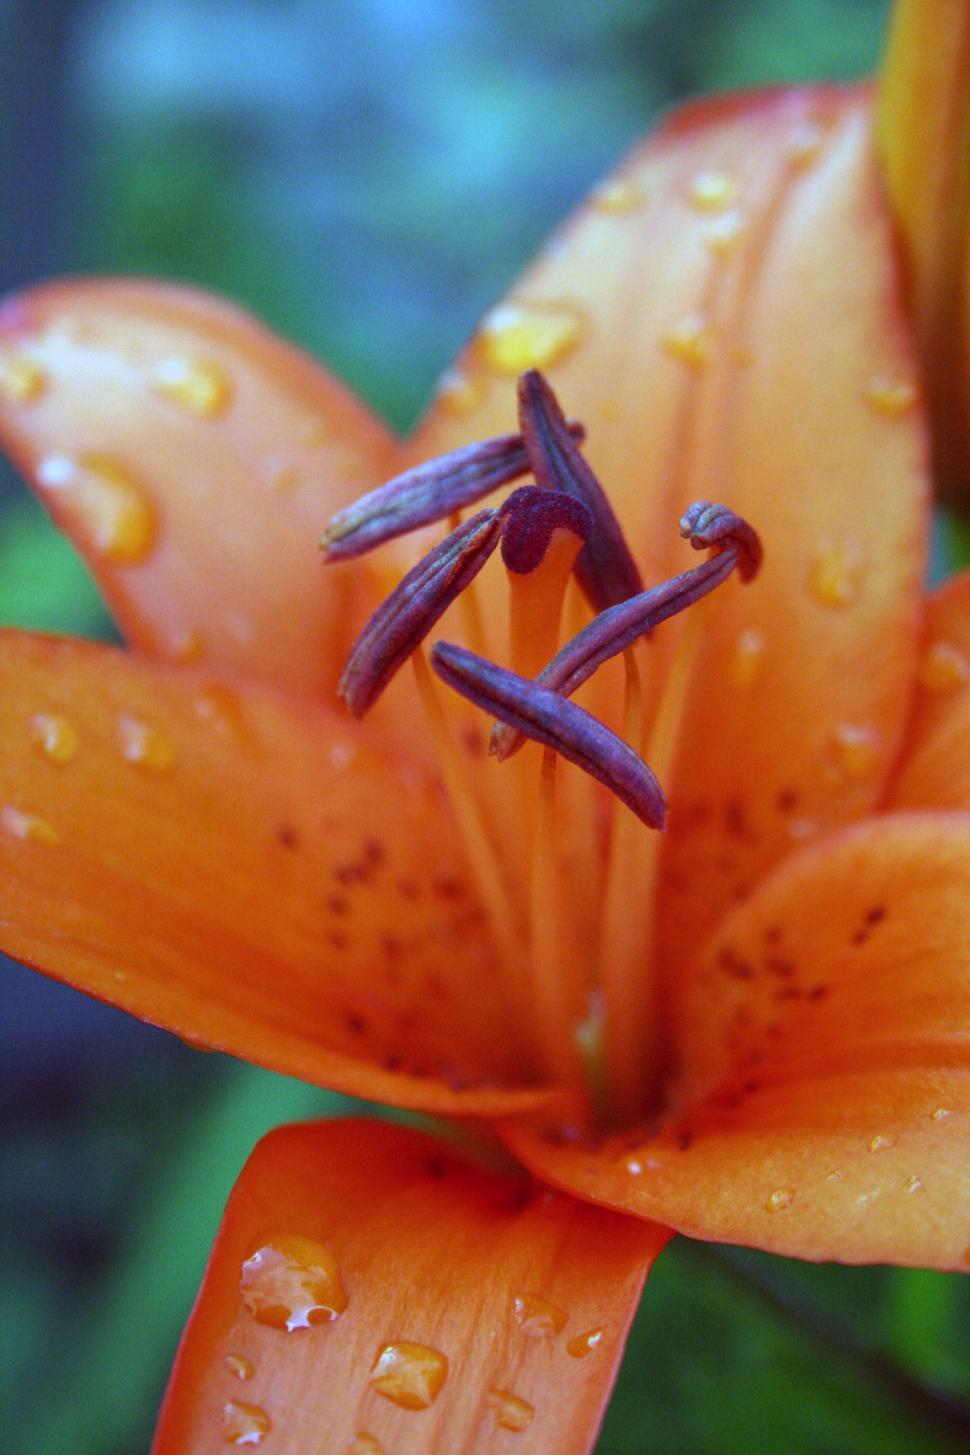 Download Free Stock Photo of Orange lily